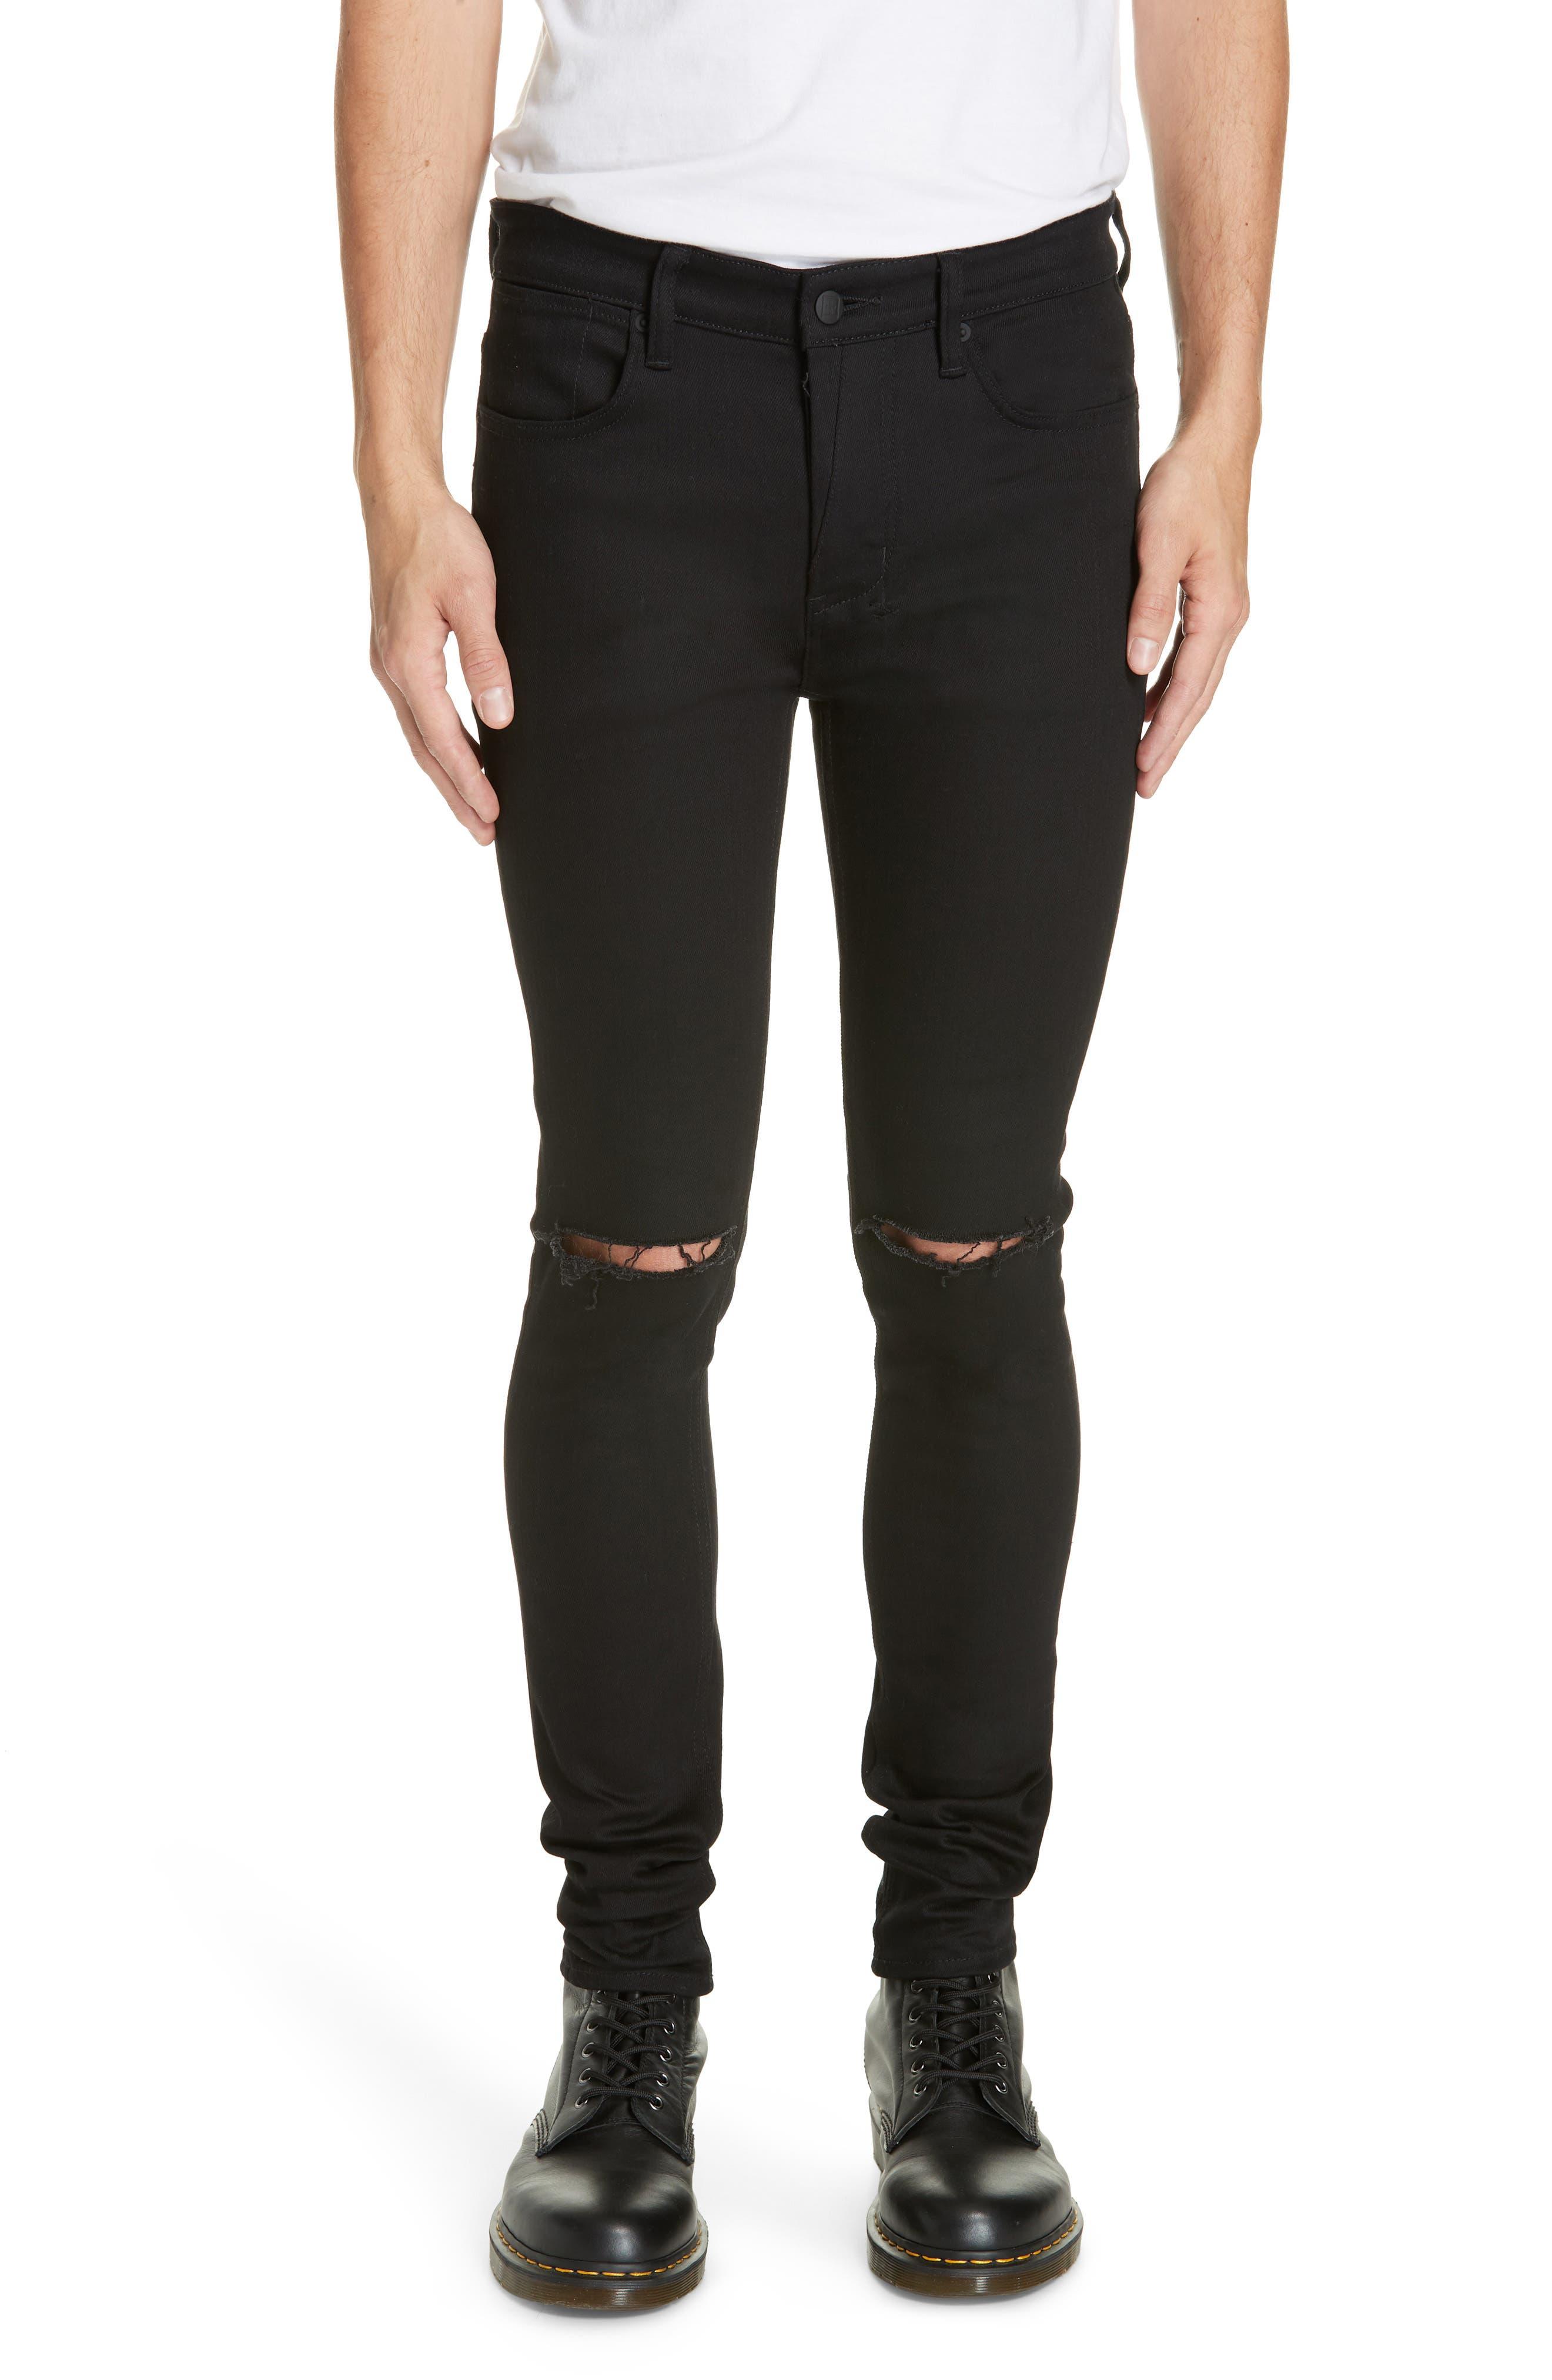 KSUBI, Van Winkle Ace Slice Jeans, Main thumbnail 1, color, BLACK